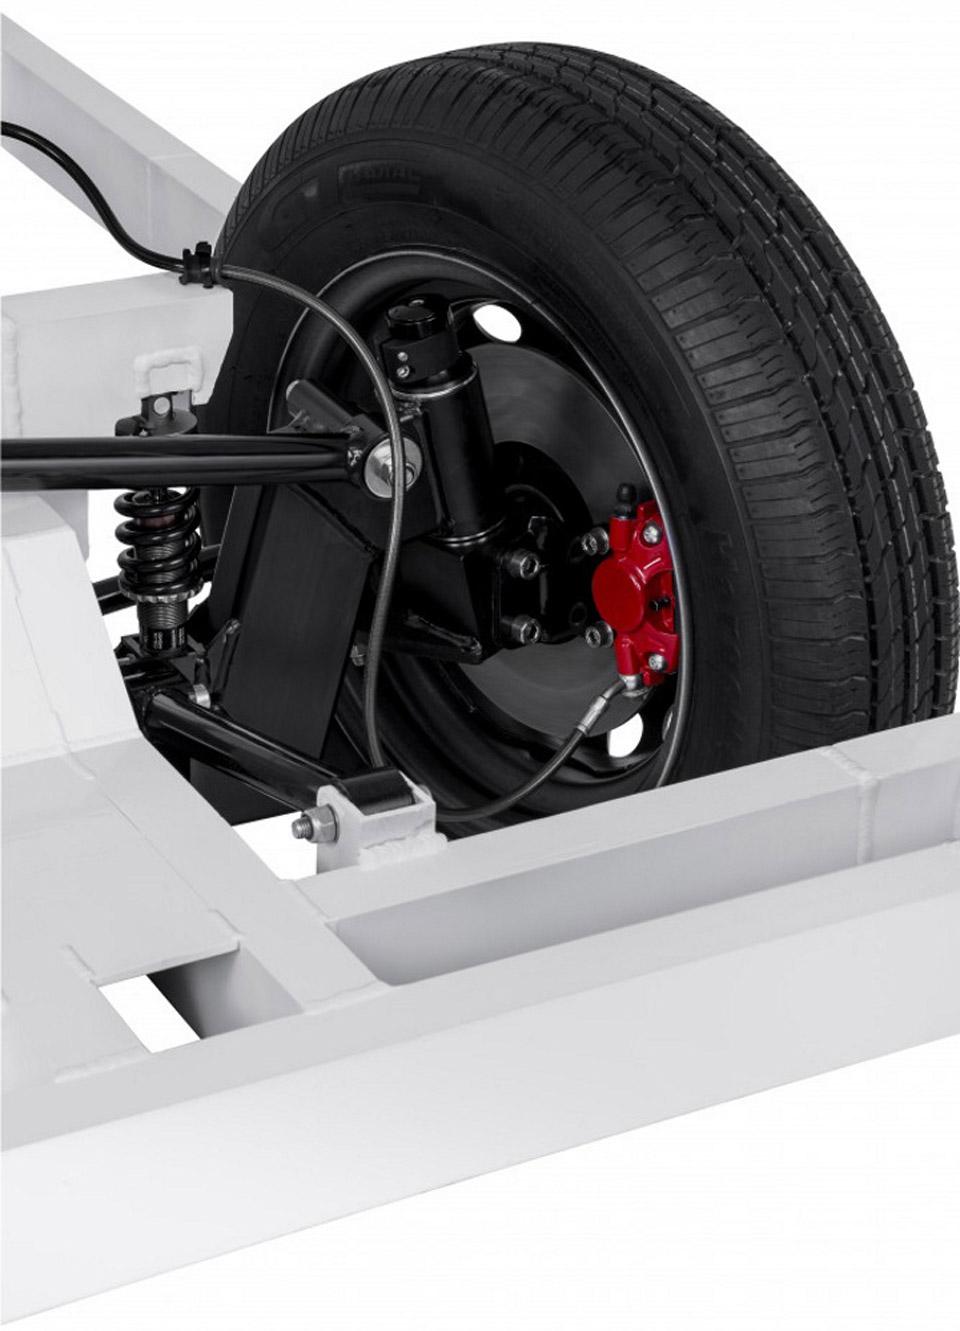 Urban Arrow Tender 2500 Flatbed- 2020